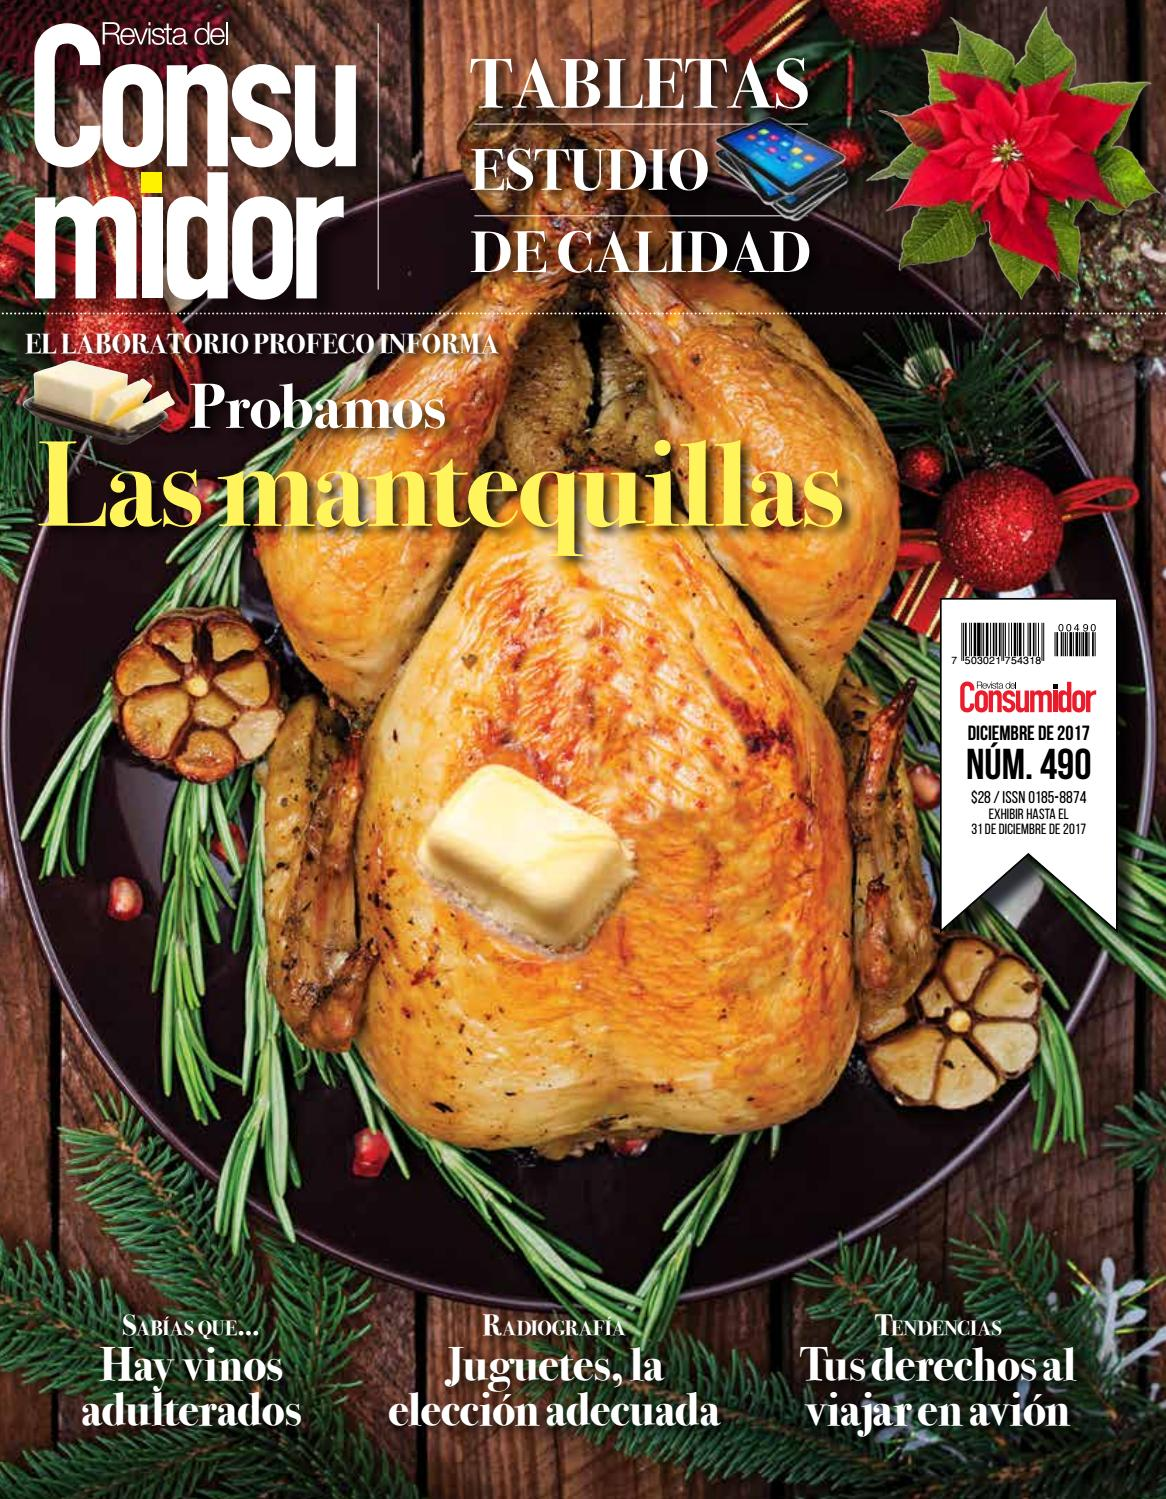 Revista del consumidor diciembre 2017 by PROFECO - issuu